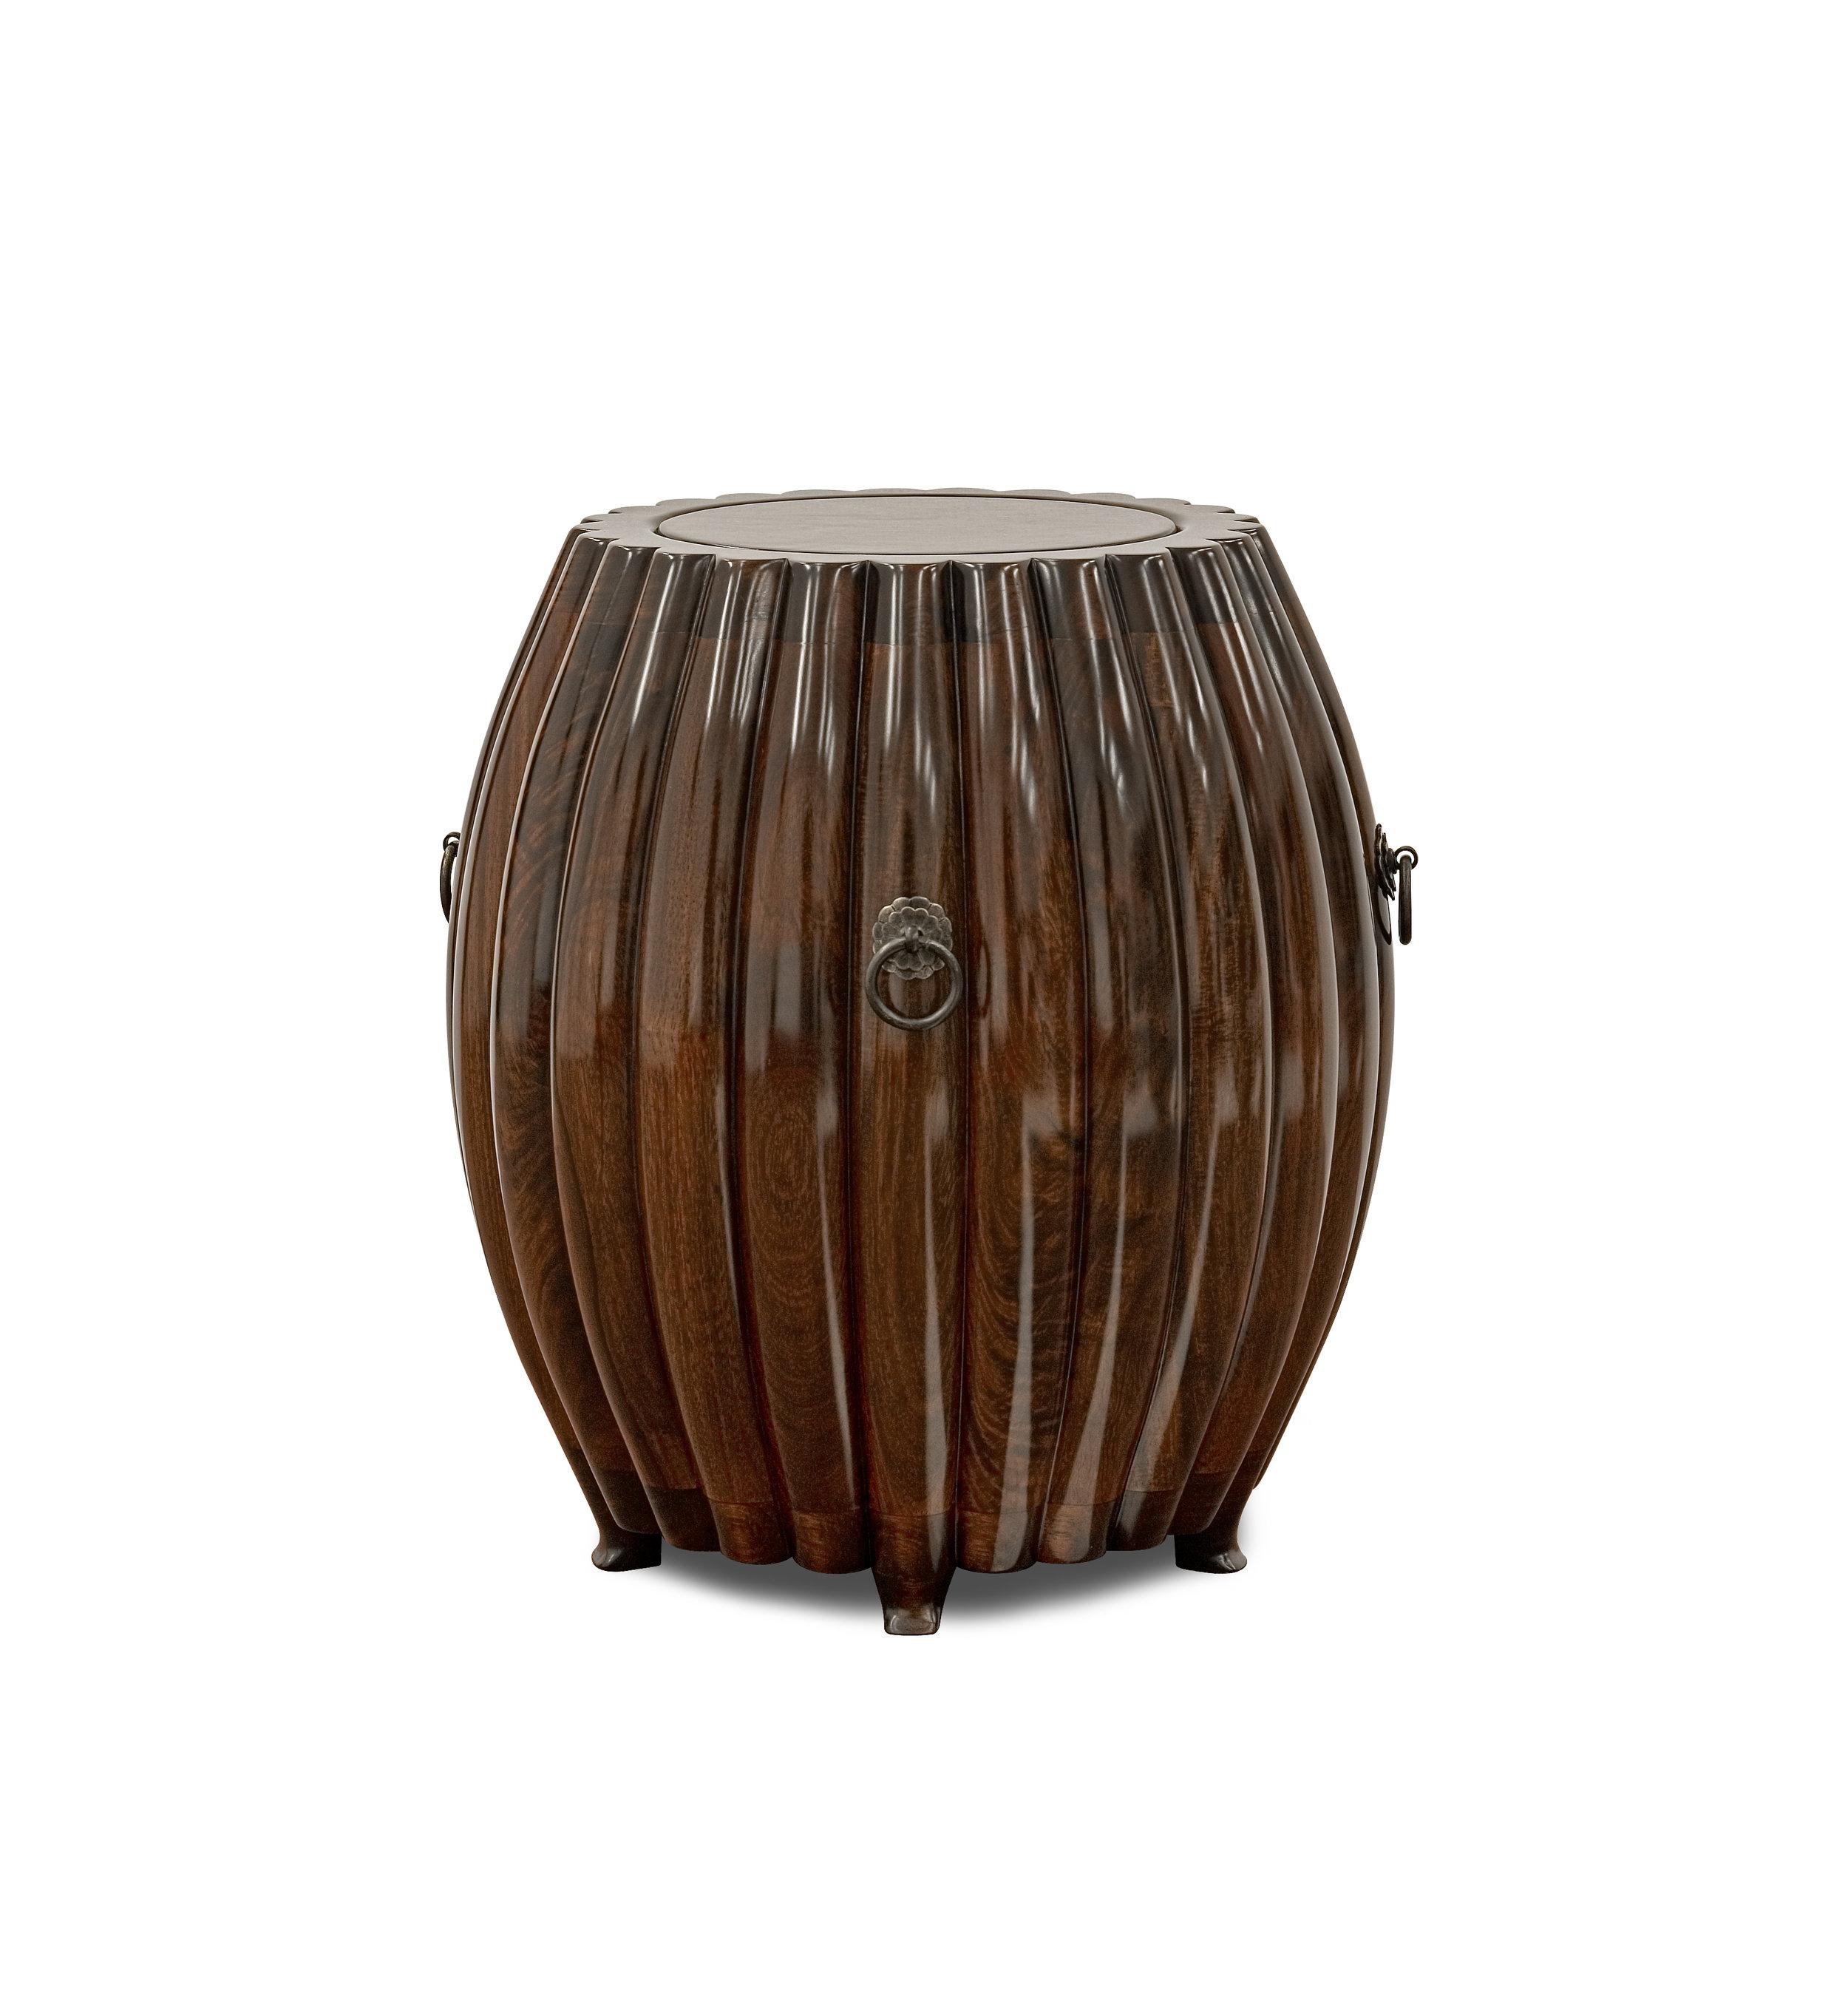 ....chinese ming style furniture : drum stool..中式明式家具 : 鼓凳....